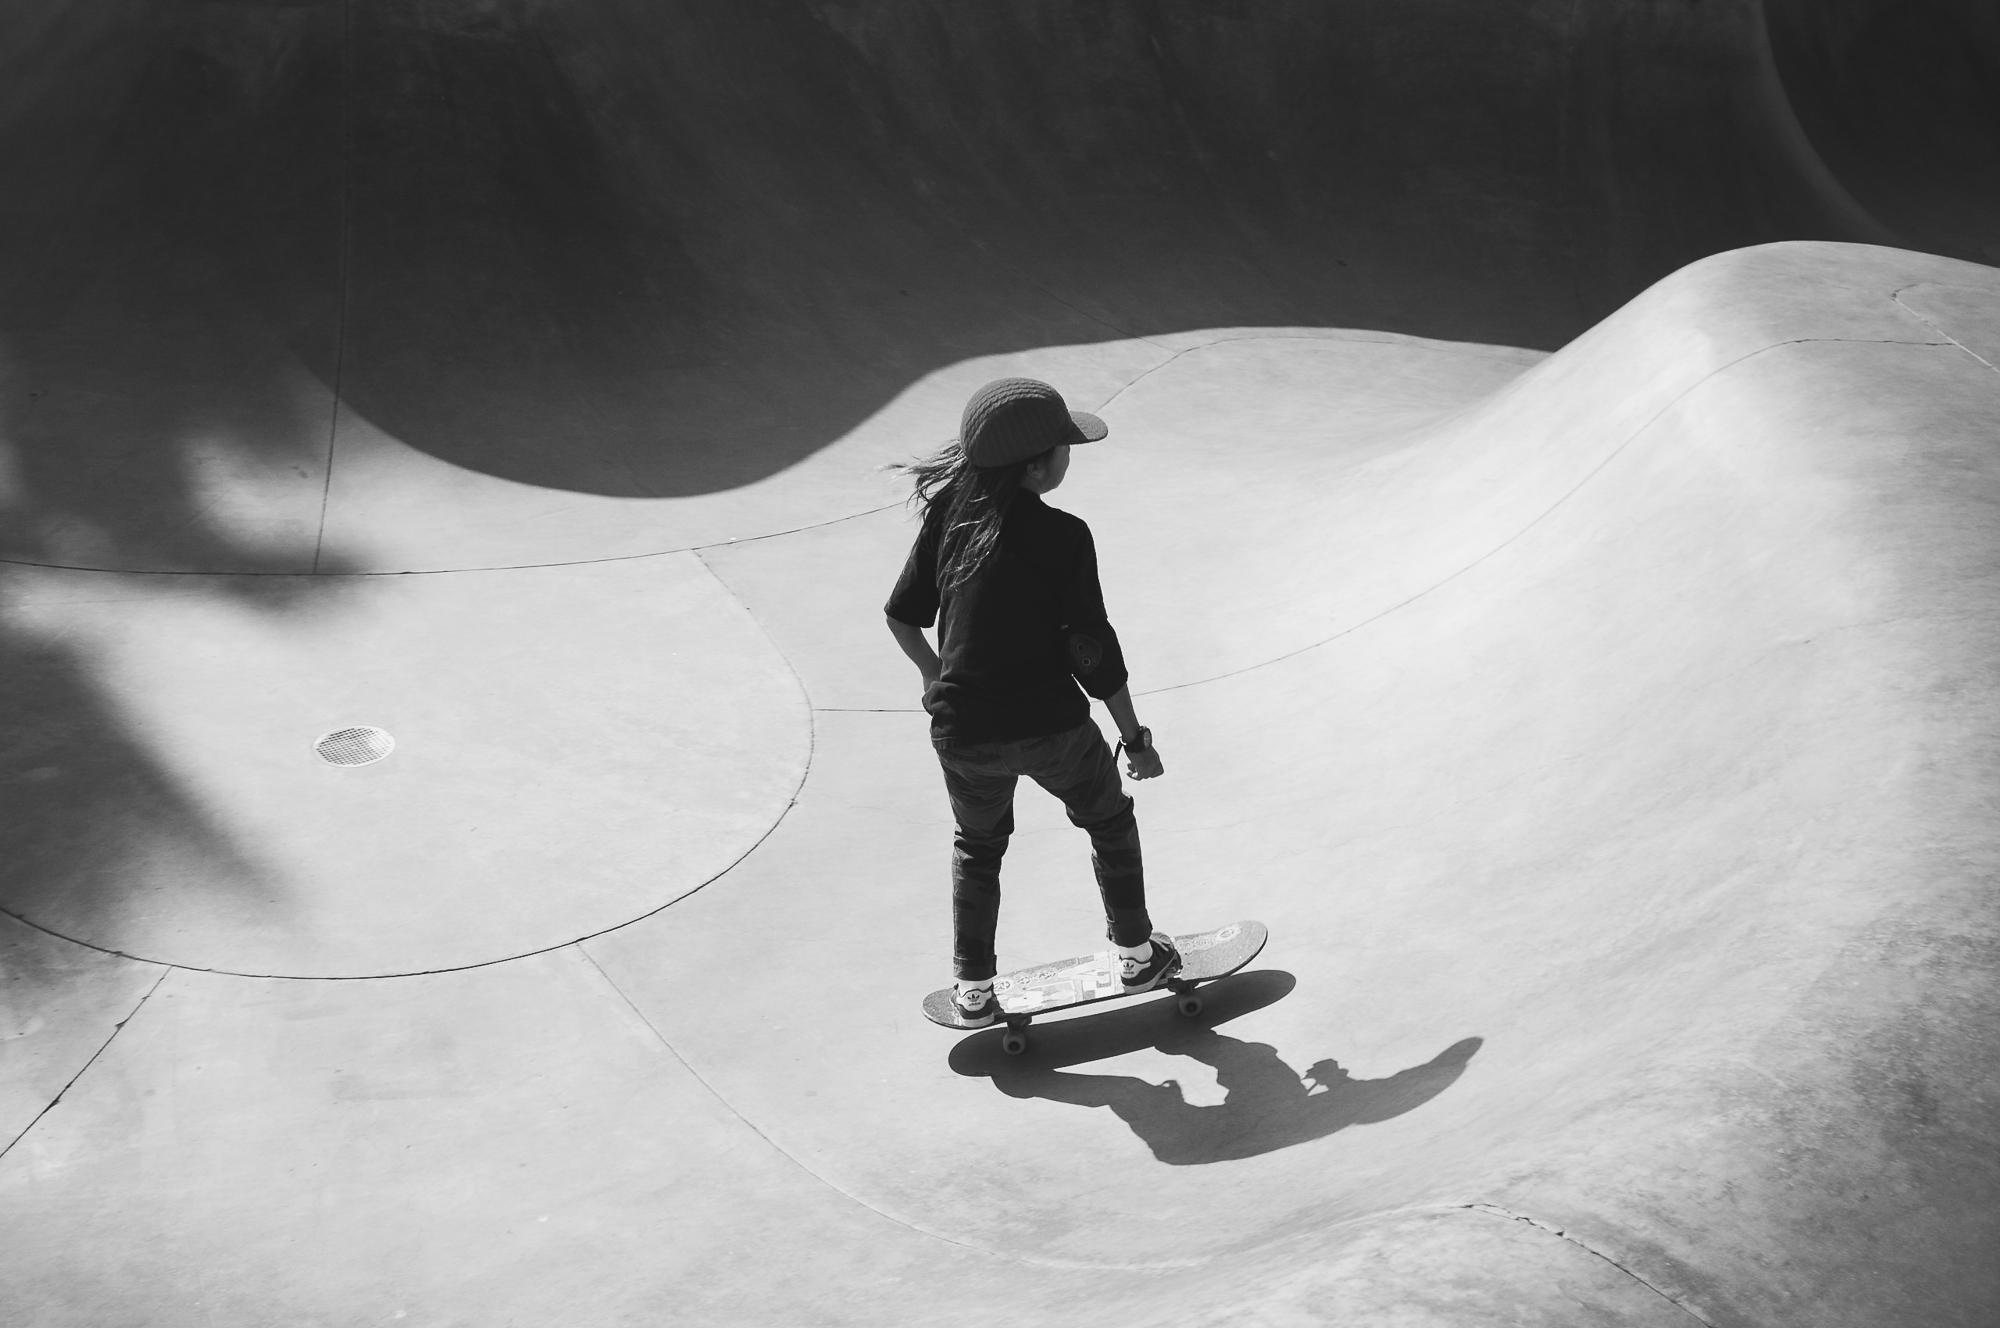 Skateboarder - Venice Beach Skatepark shot on Fuji x-100